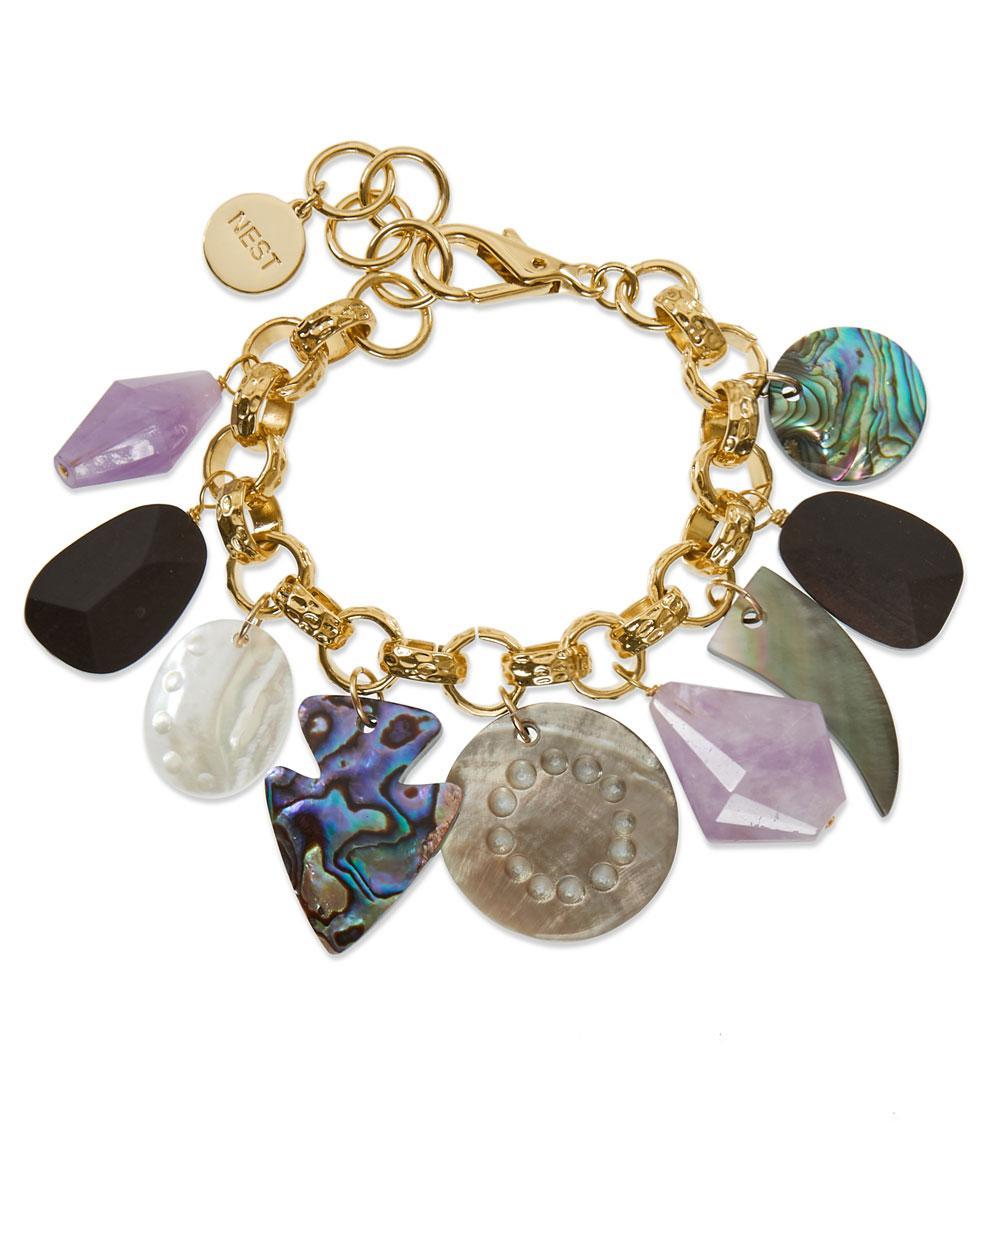 Nest Mother-of-Pearl & Amethyst Charm Bracelet onf7rJWmdC